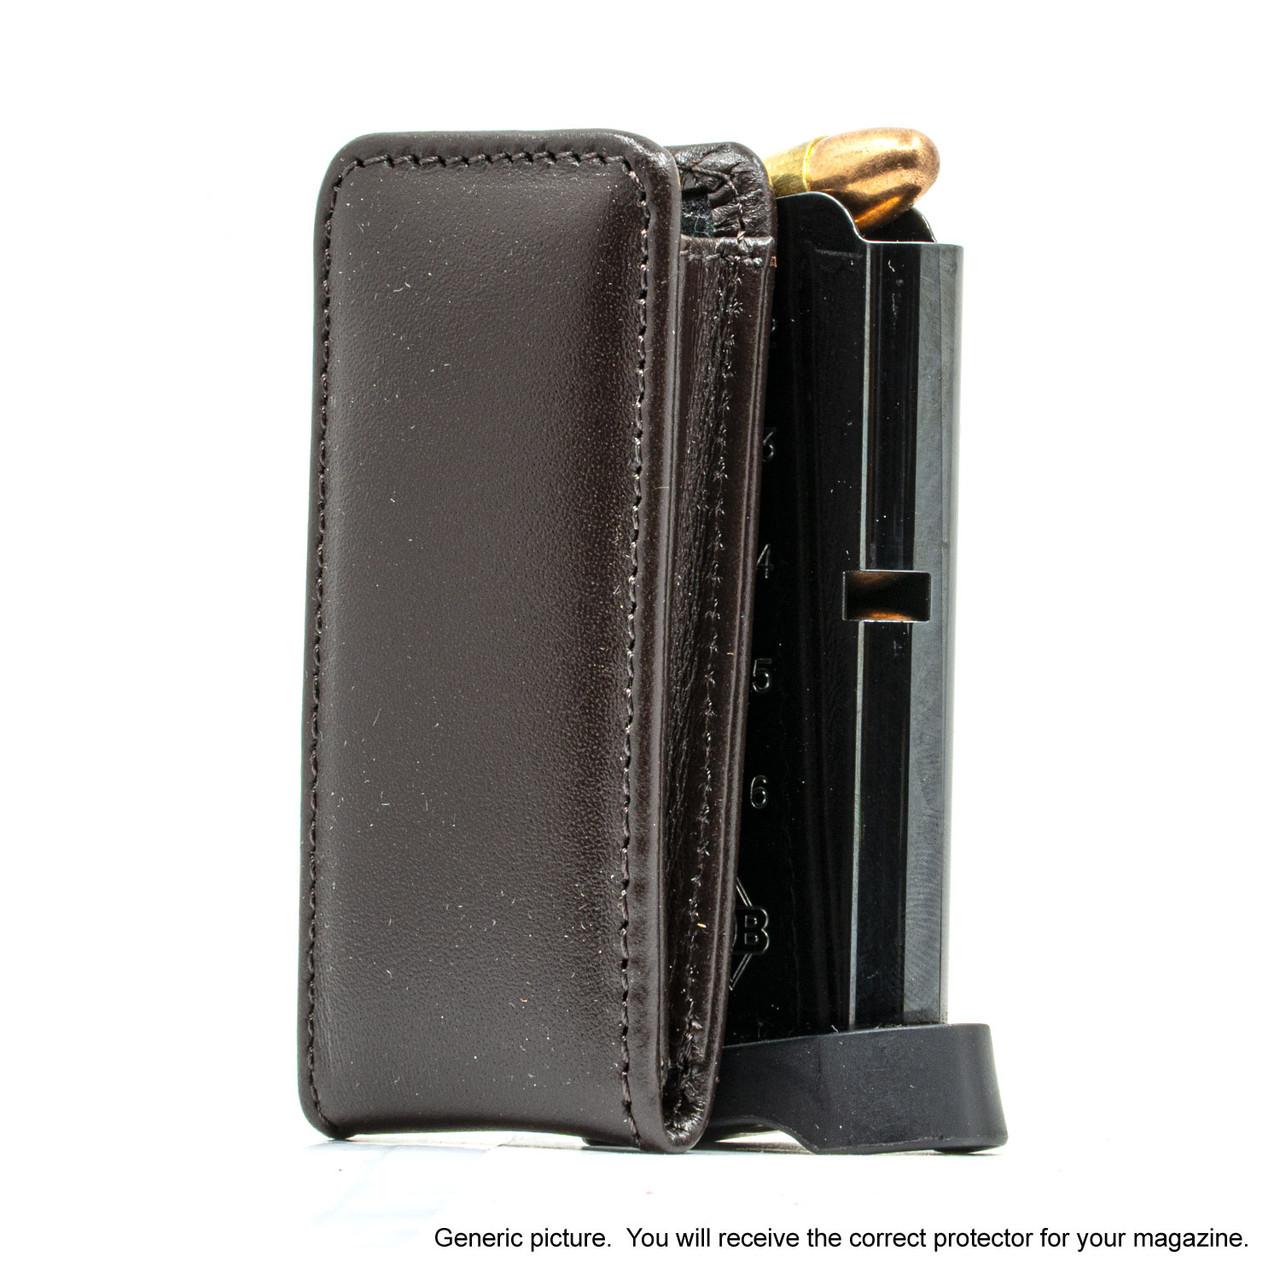 Bersa BP9CC Brown Leather Magazine Pocket Protector